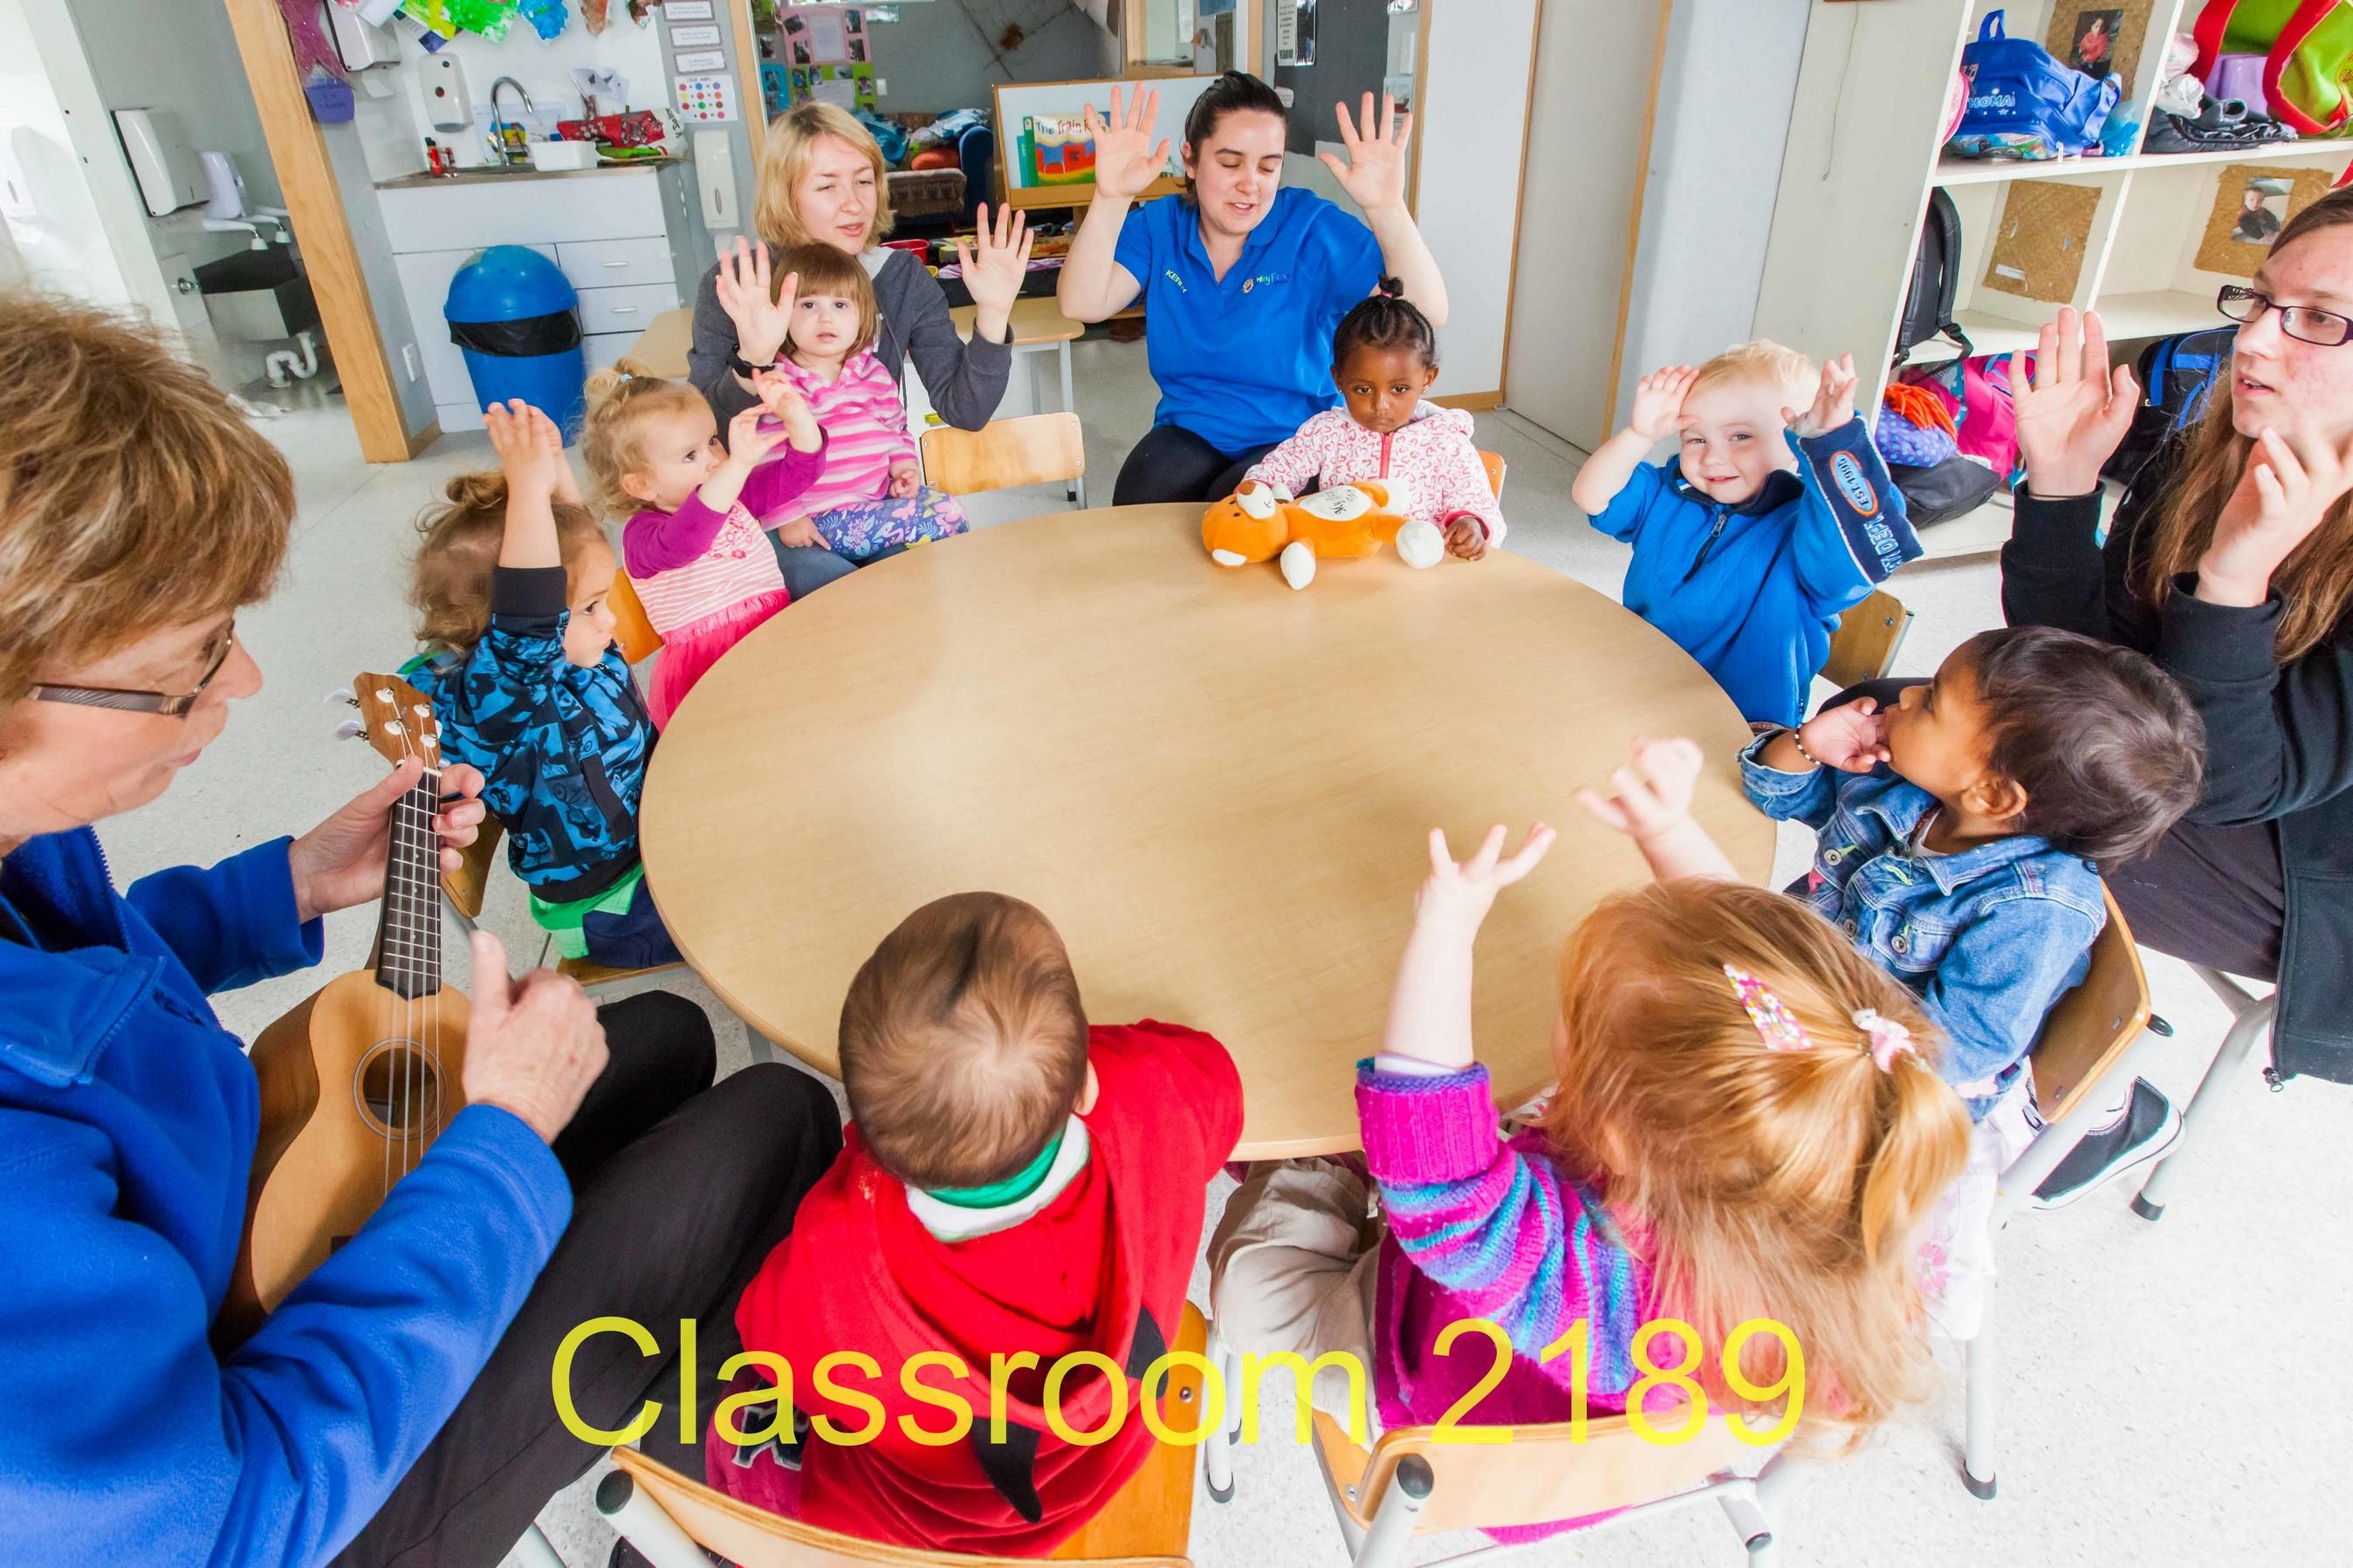 Classroom 2189